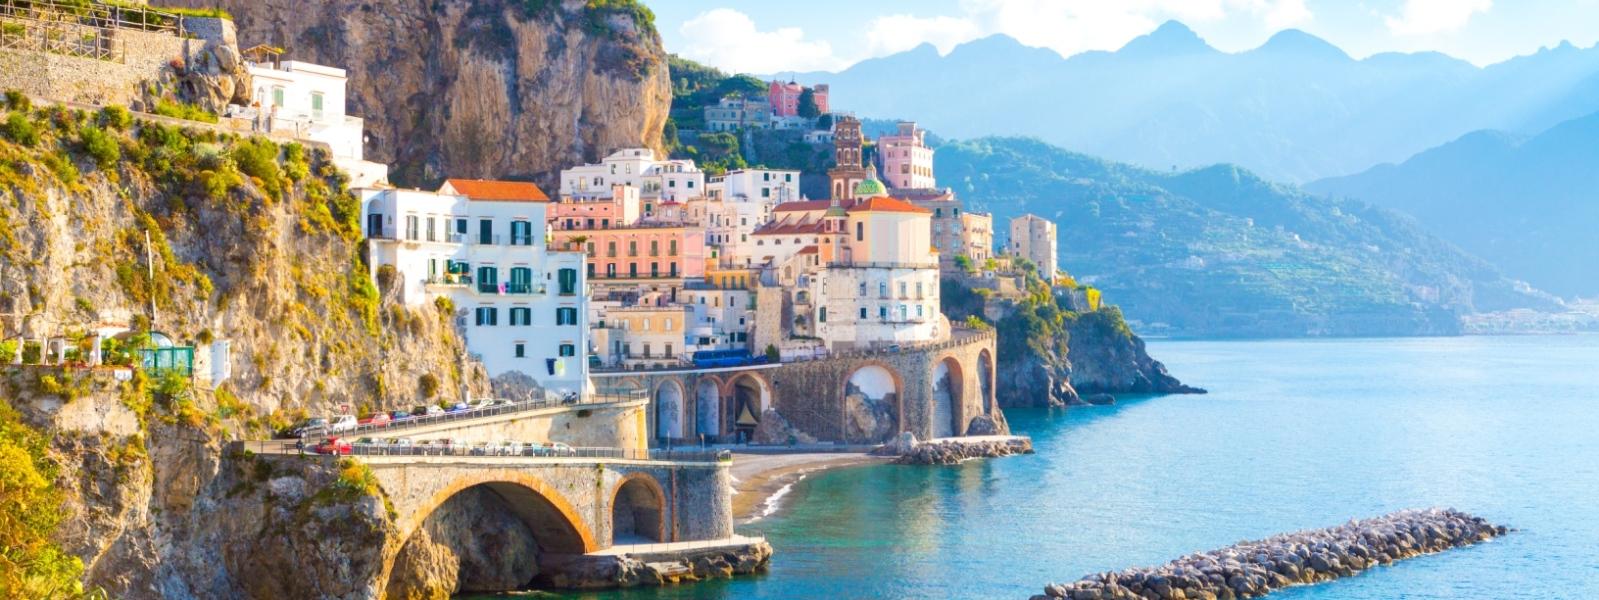 Appian Way | from Bari to Rome